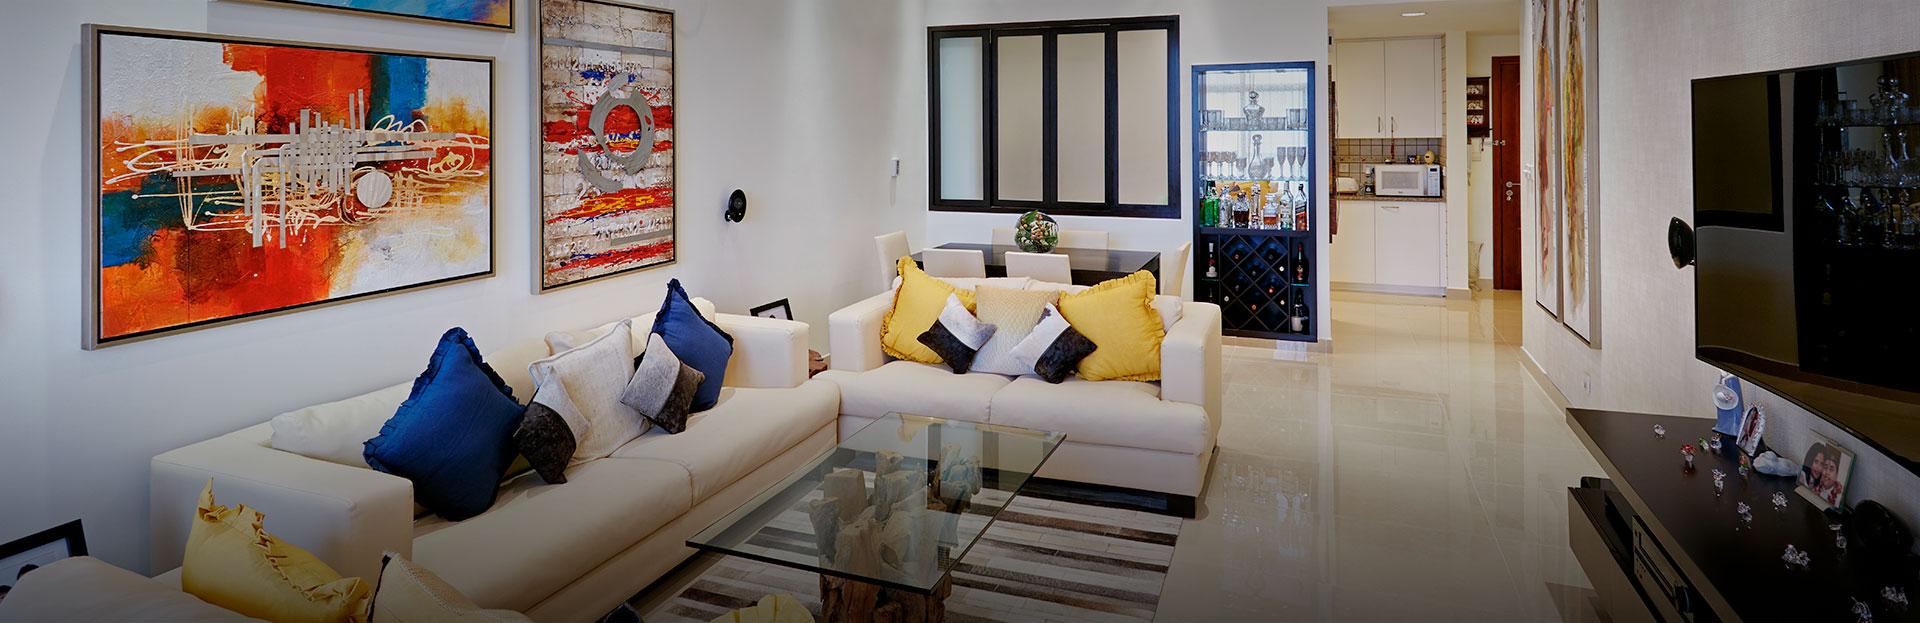 Home Interior Design Service Home Interior Design Company Dubai